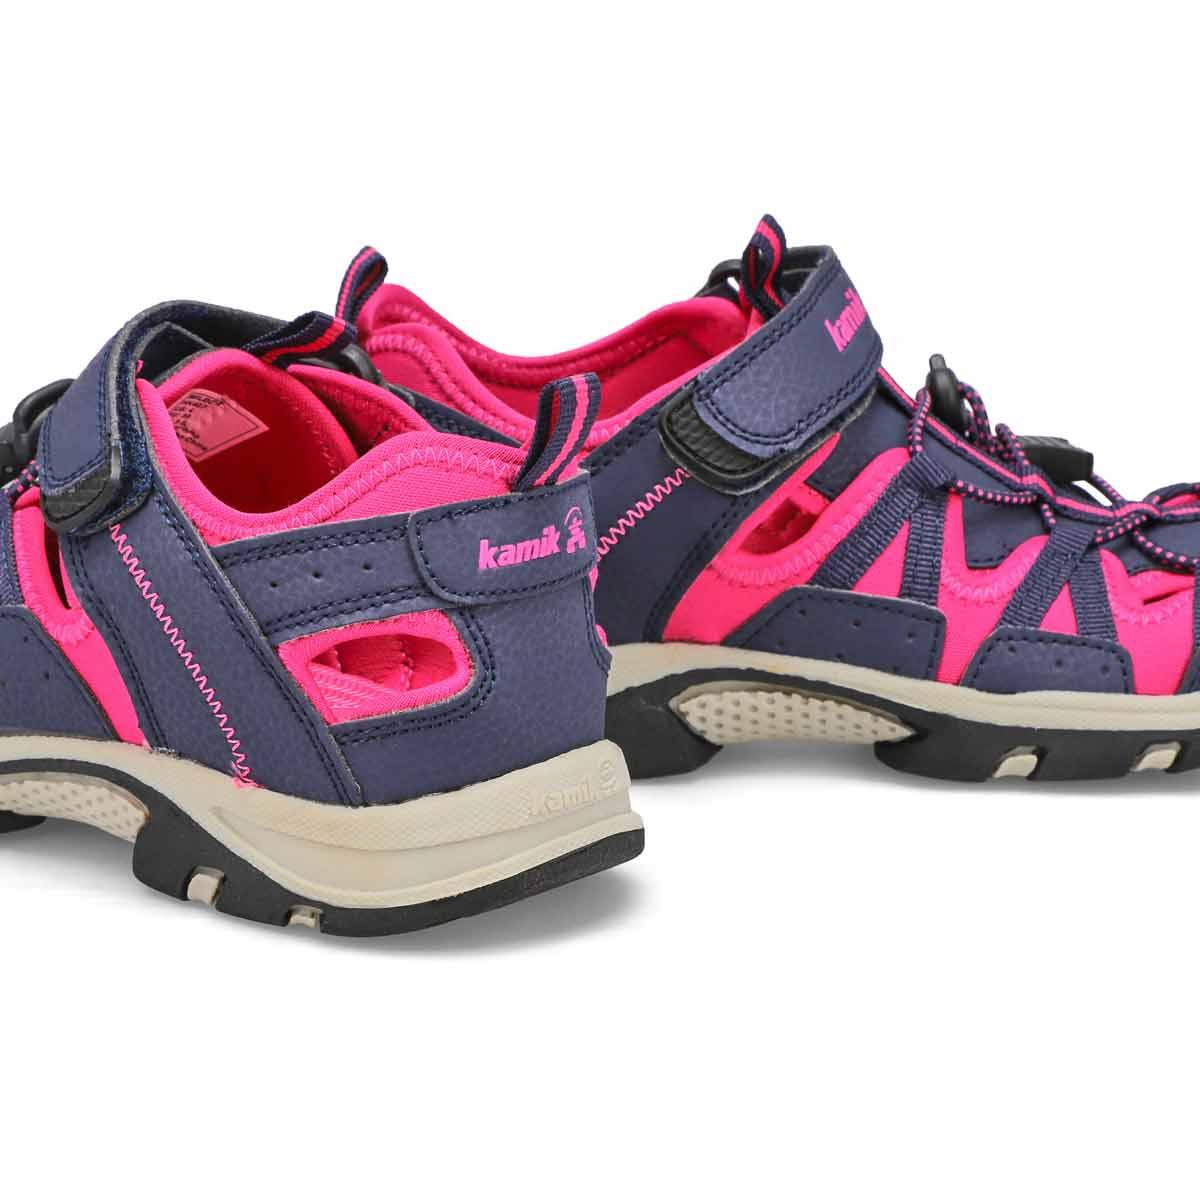 Kamik Kids Wildcat Shoes